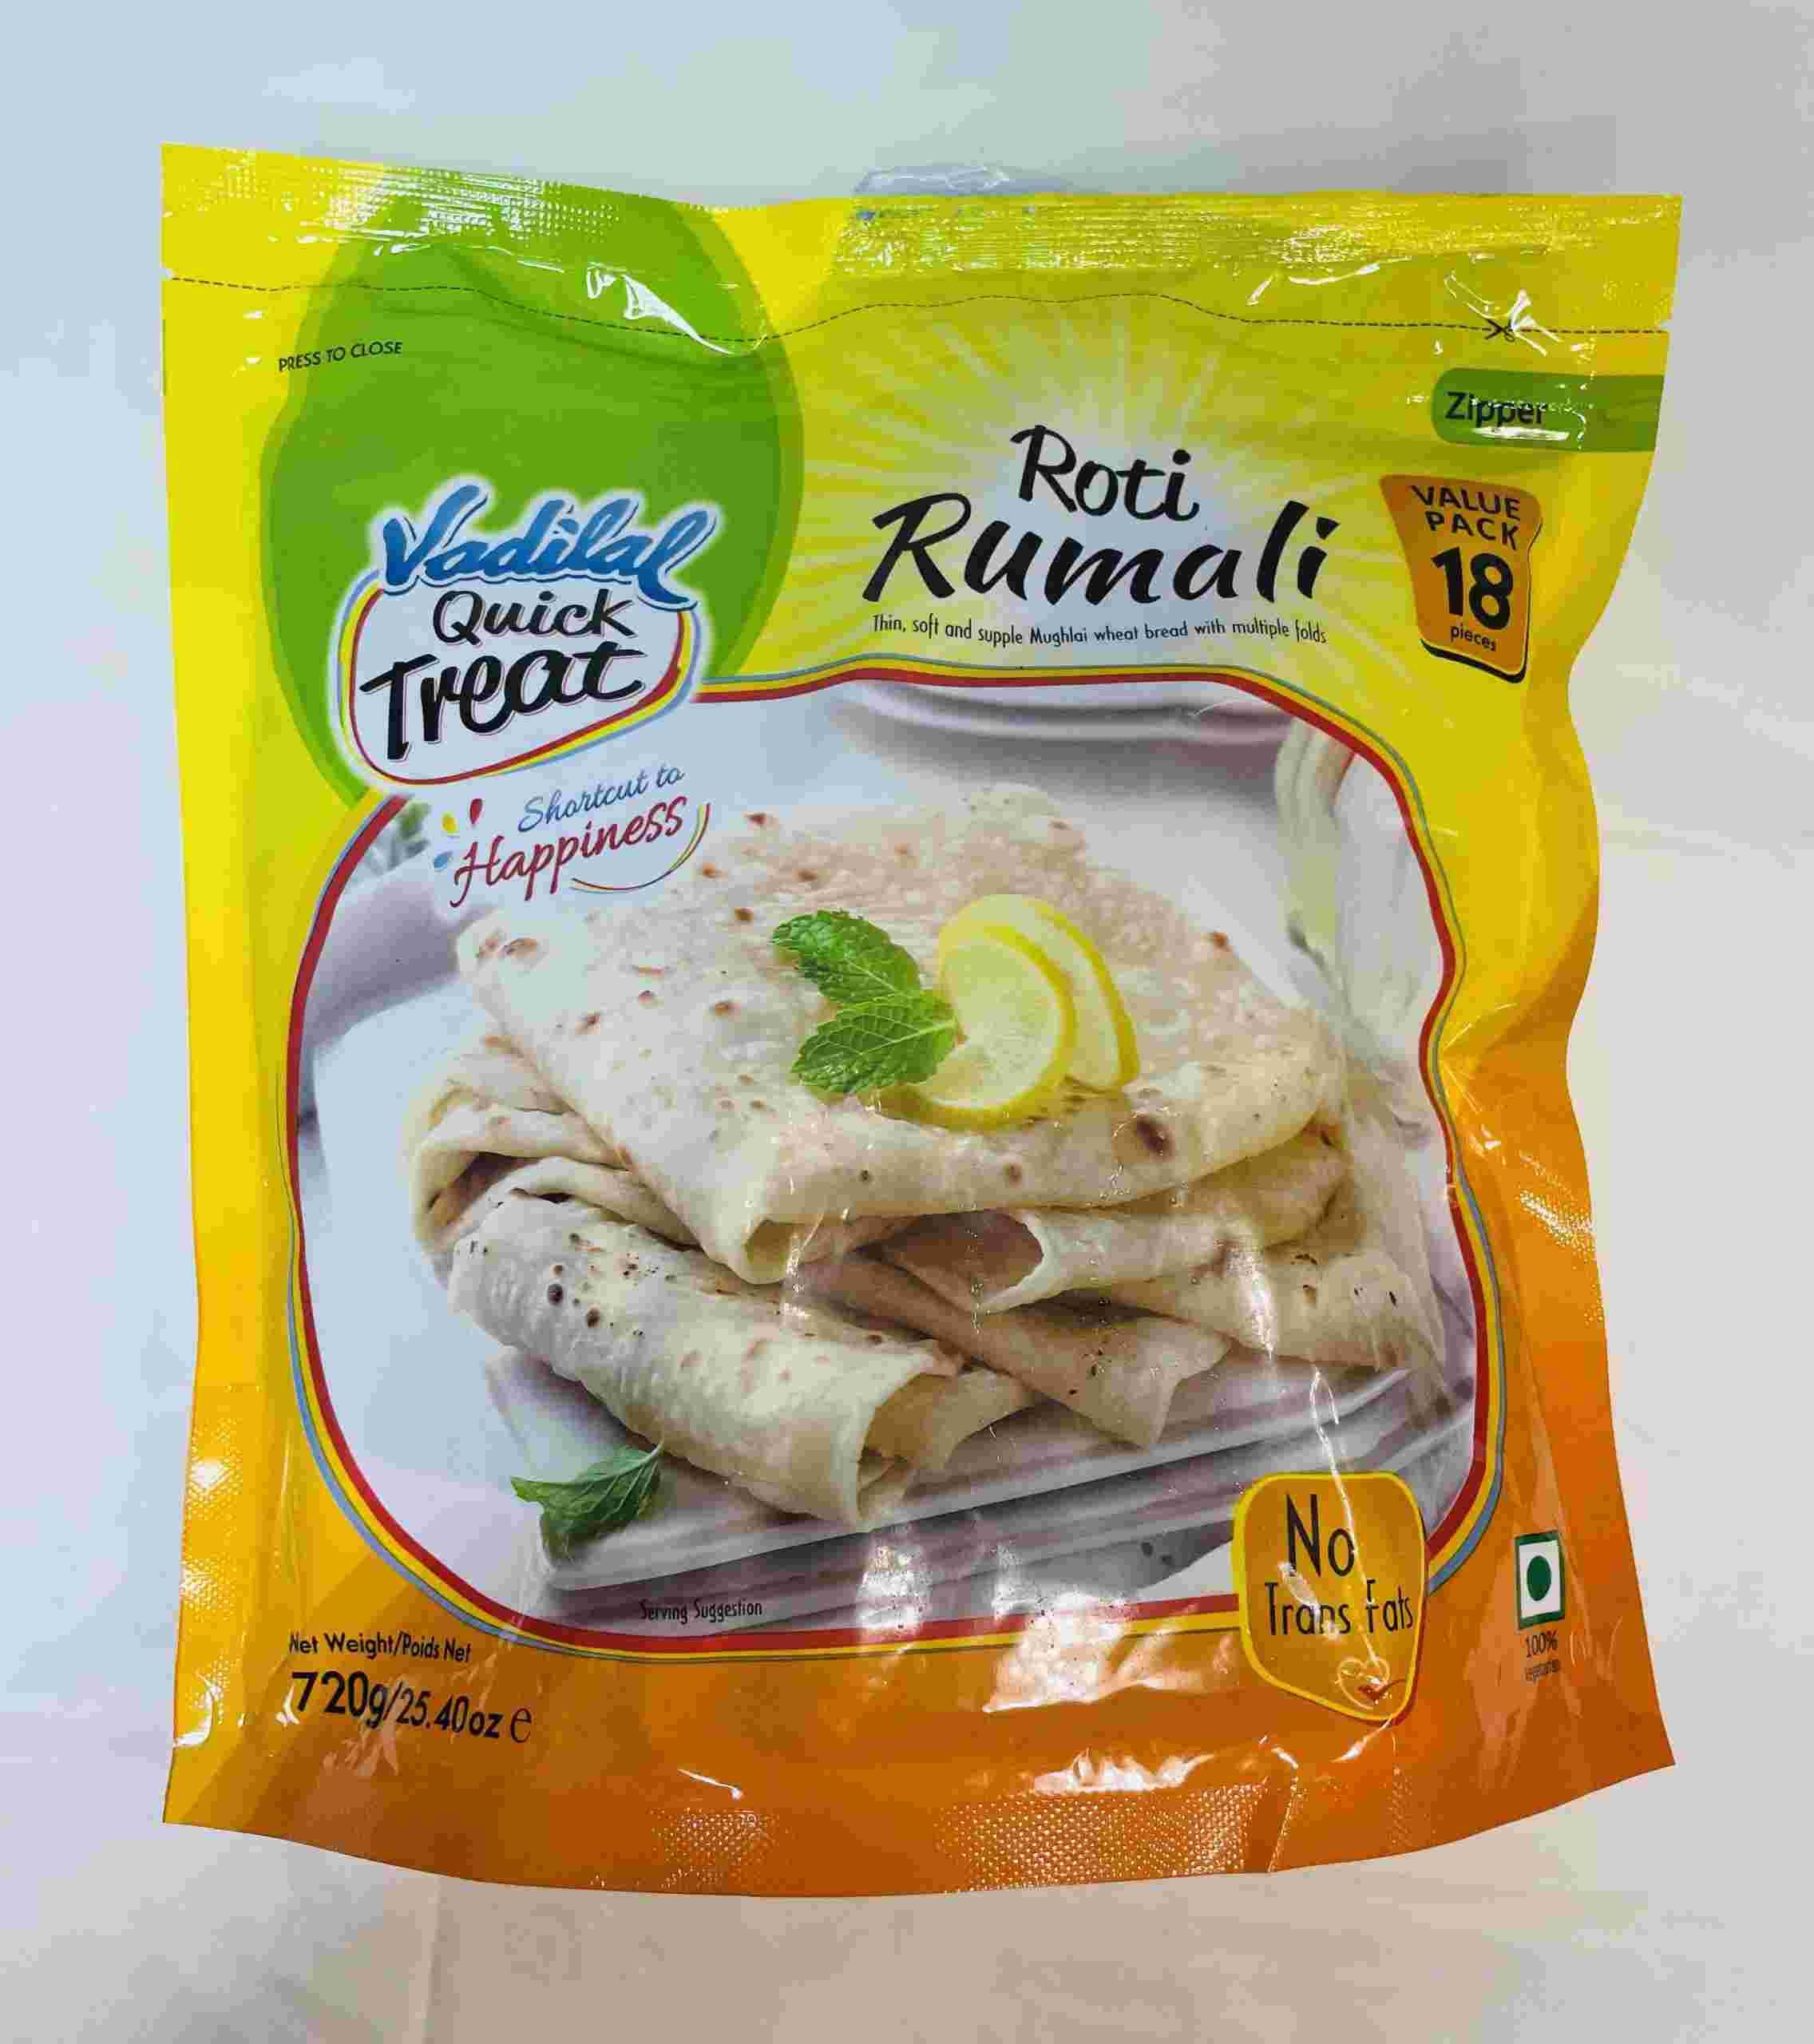 Vadilal Rumali Roti 18 Pieces Value Pack